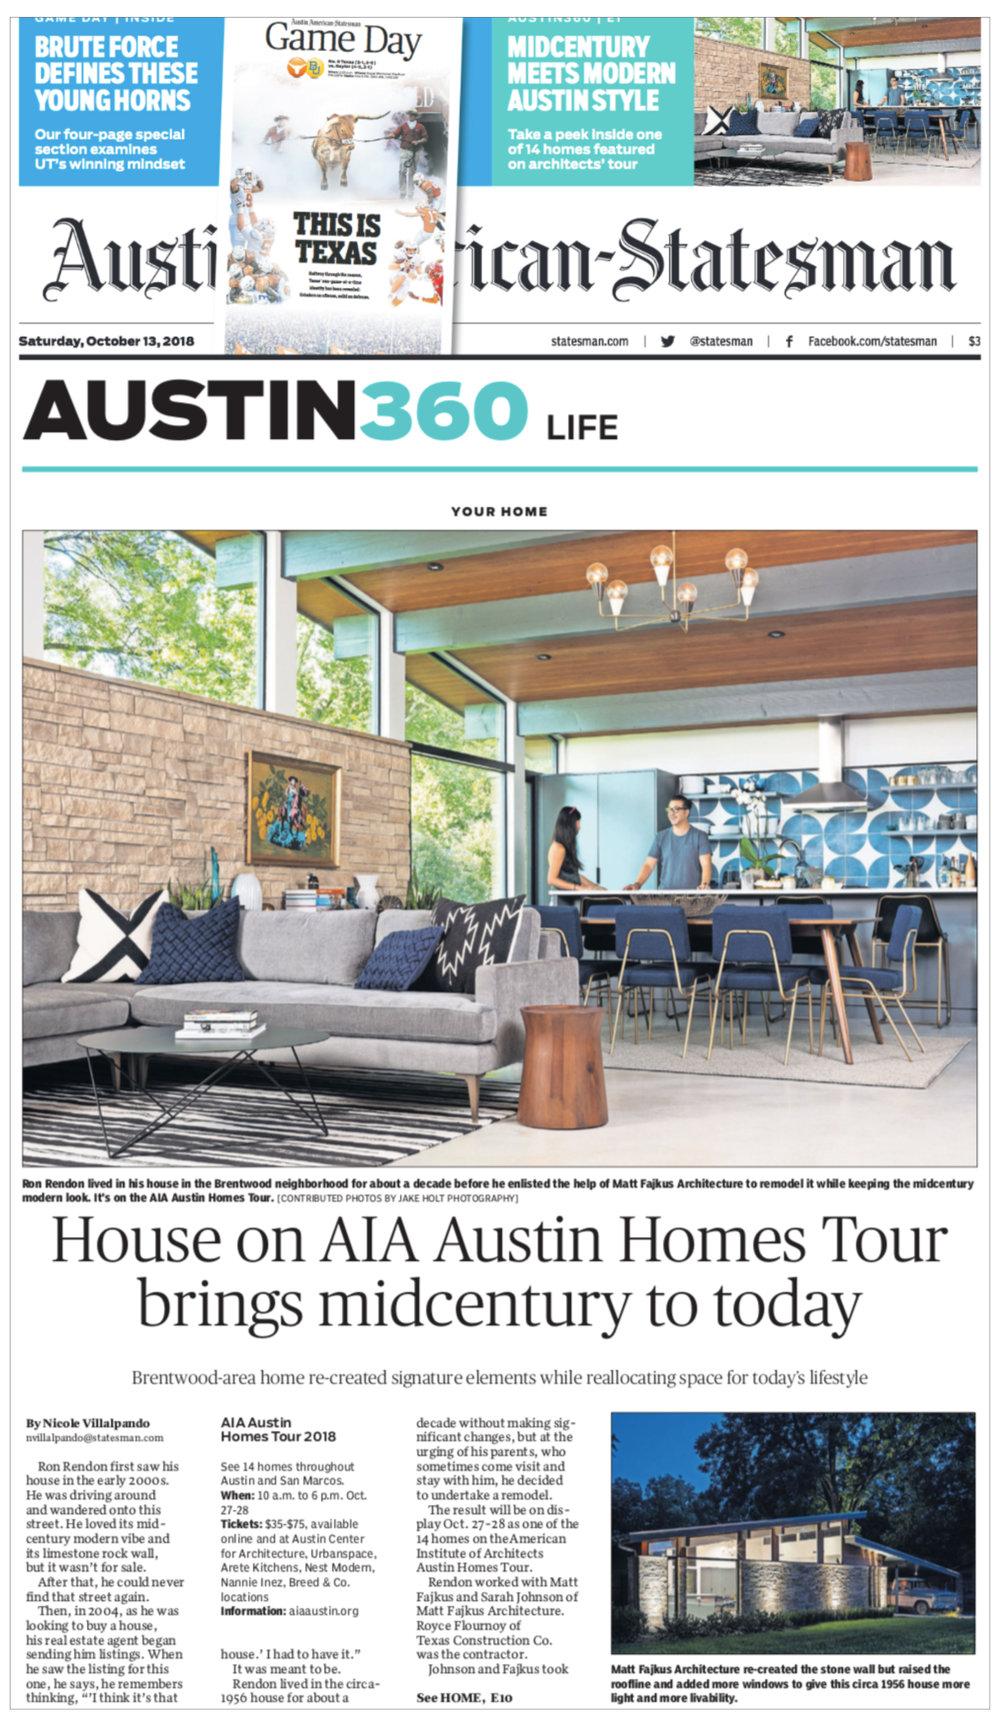 Microsoft Word - Austin American-Statesman AIA Austin Homes Tour